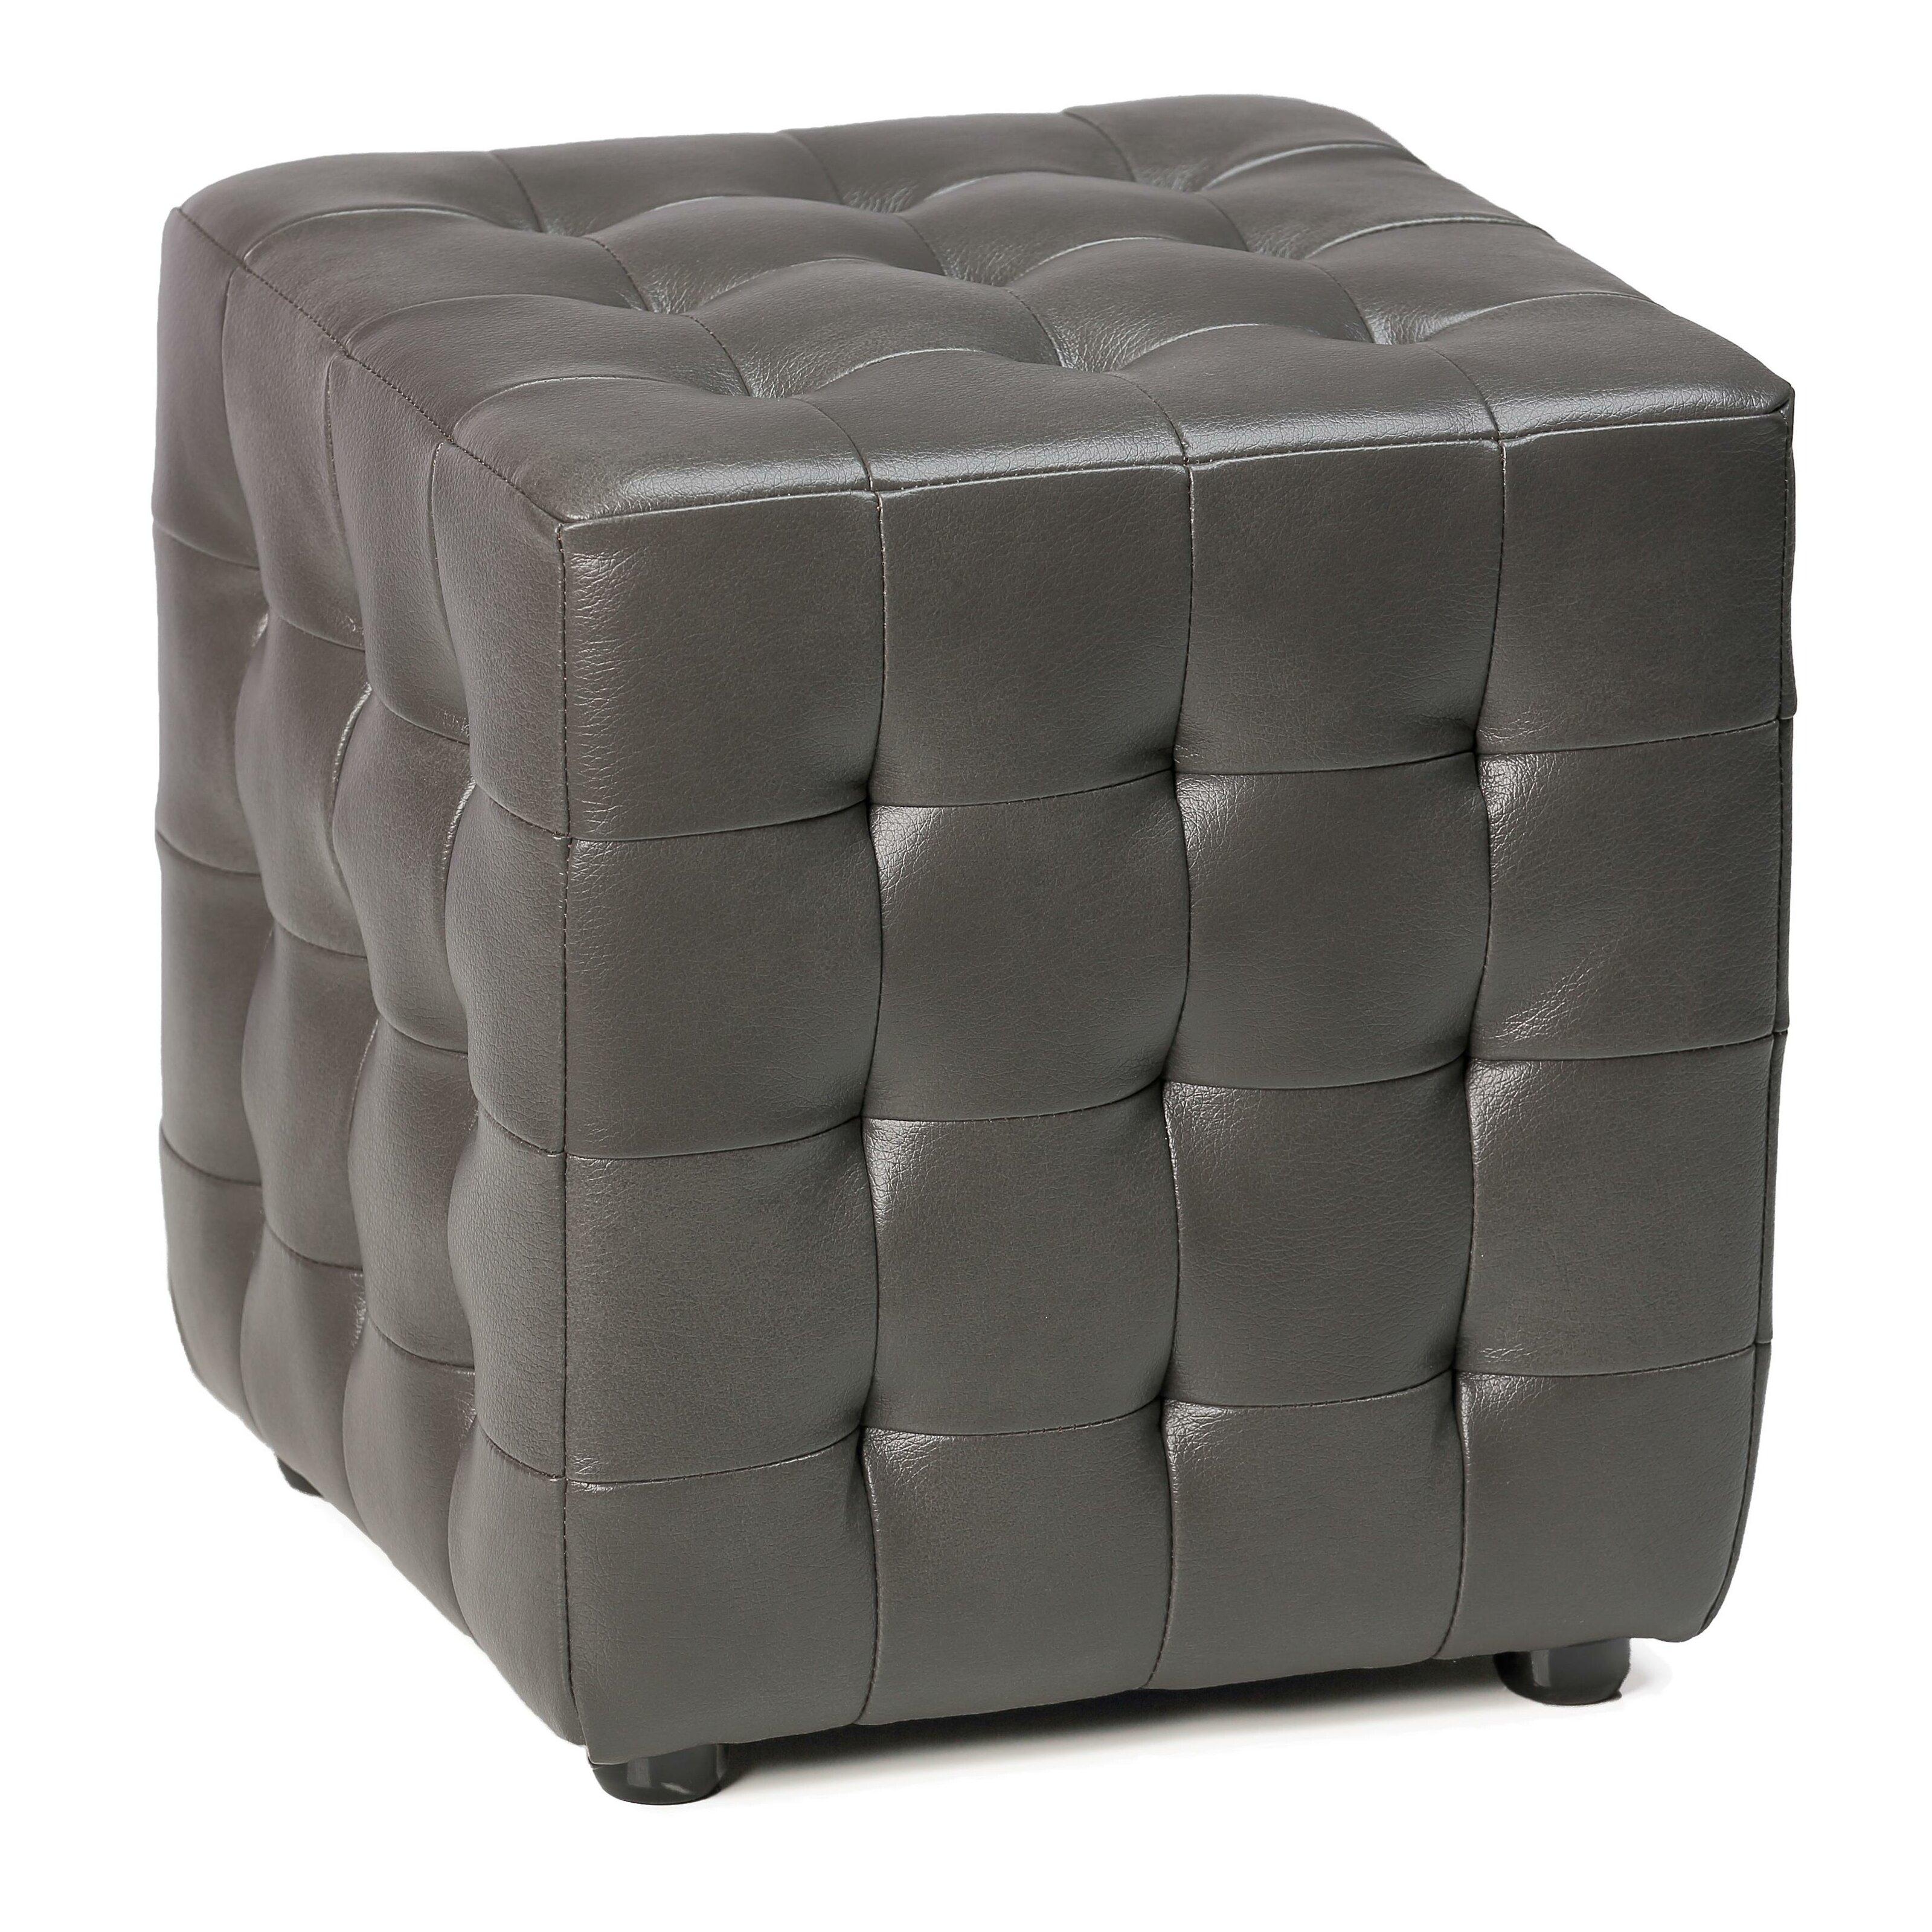 Cortesi Home Izzo Cube Ottoman Reviews Wayfair